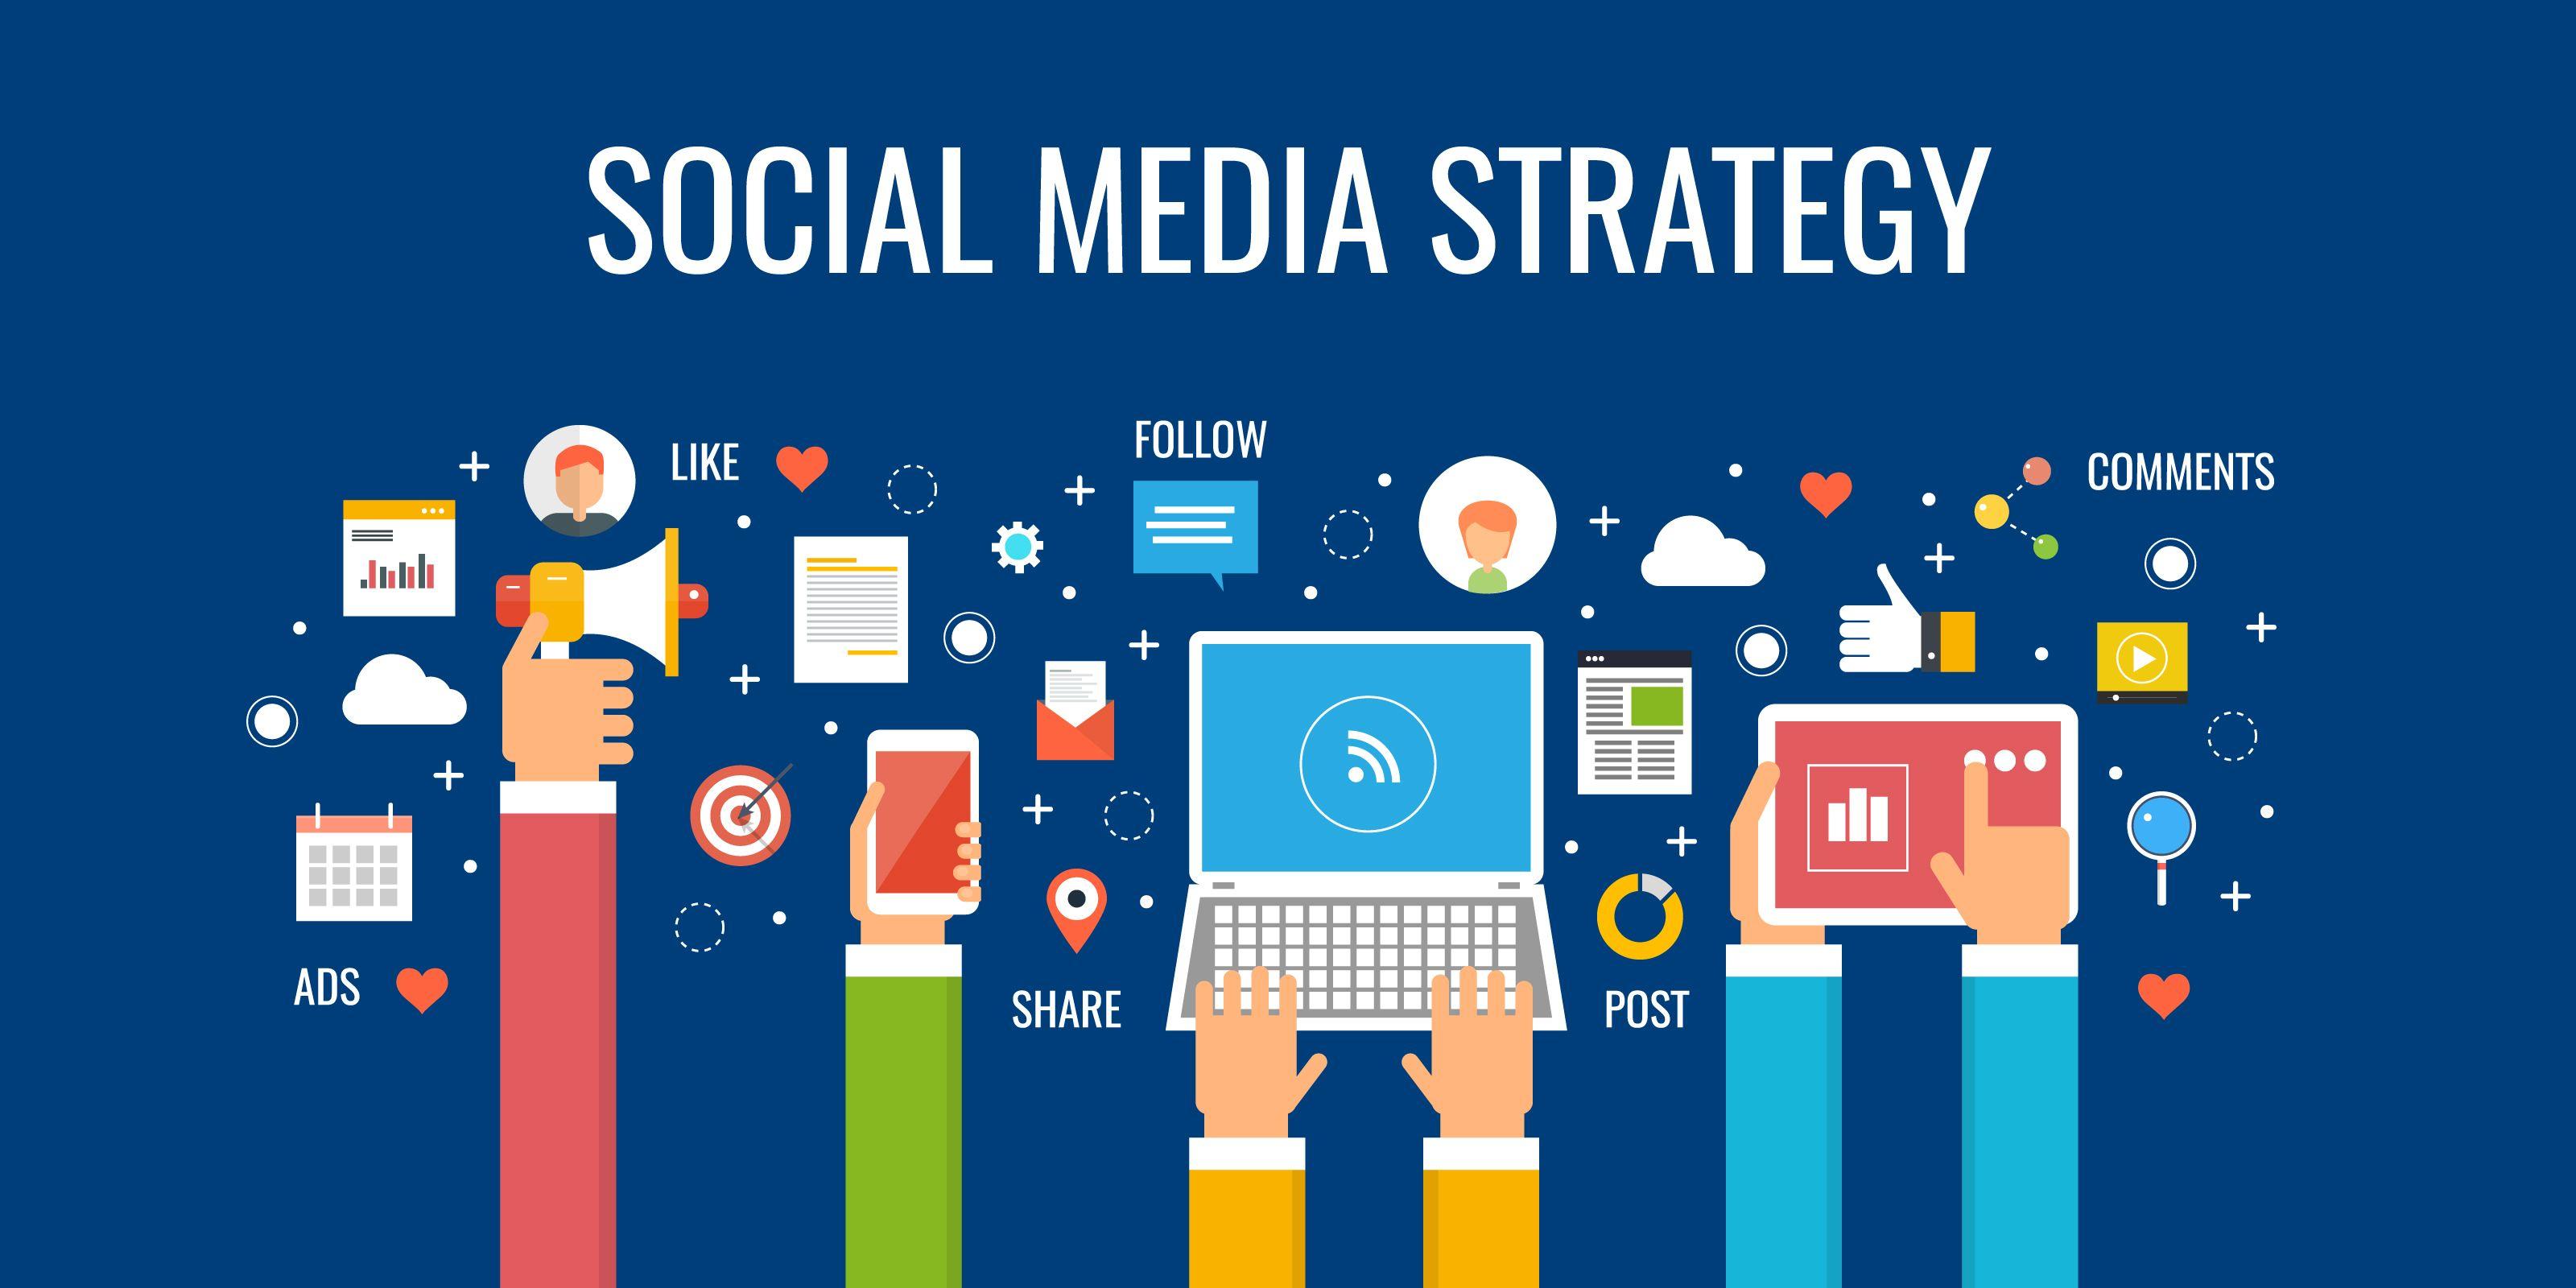 Social Media Advertising Agency Why You Need The Best Social Media Manage Social Media Marketing Agency Social Media Marketing Services Social Media Strategies